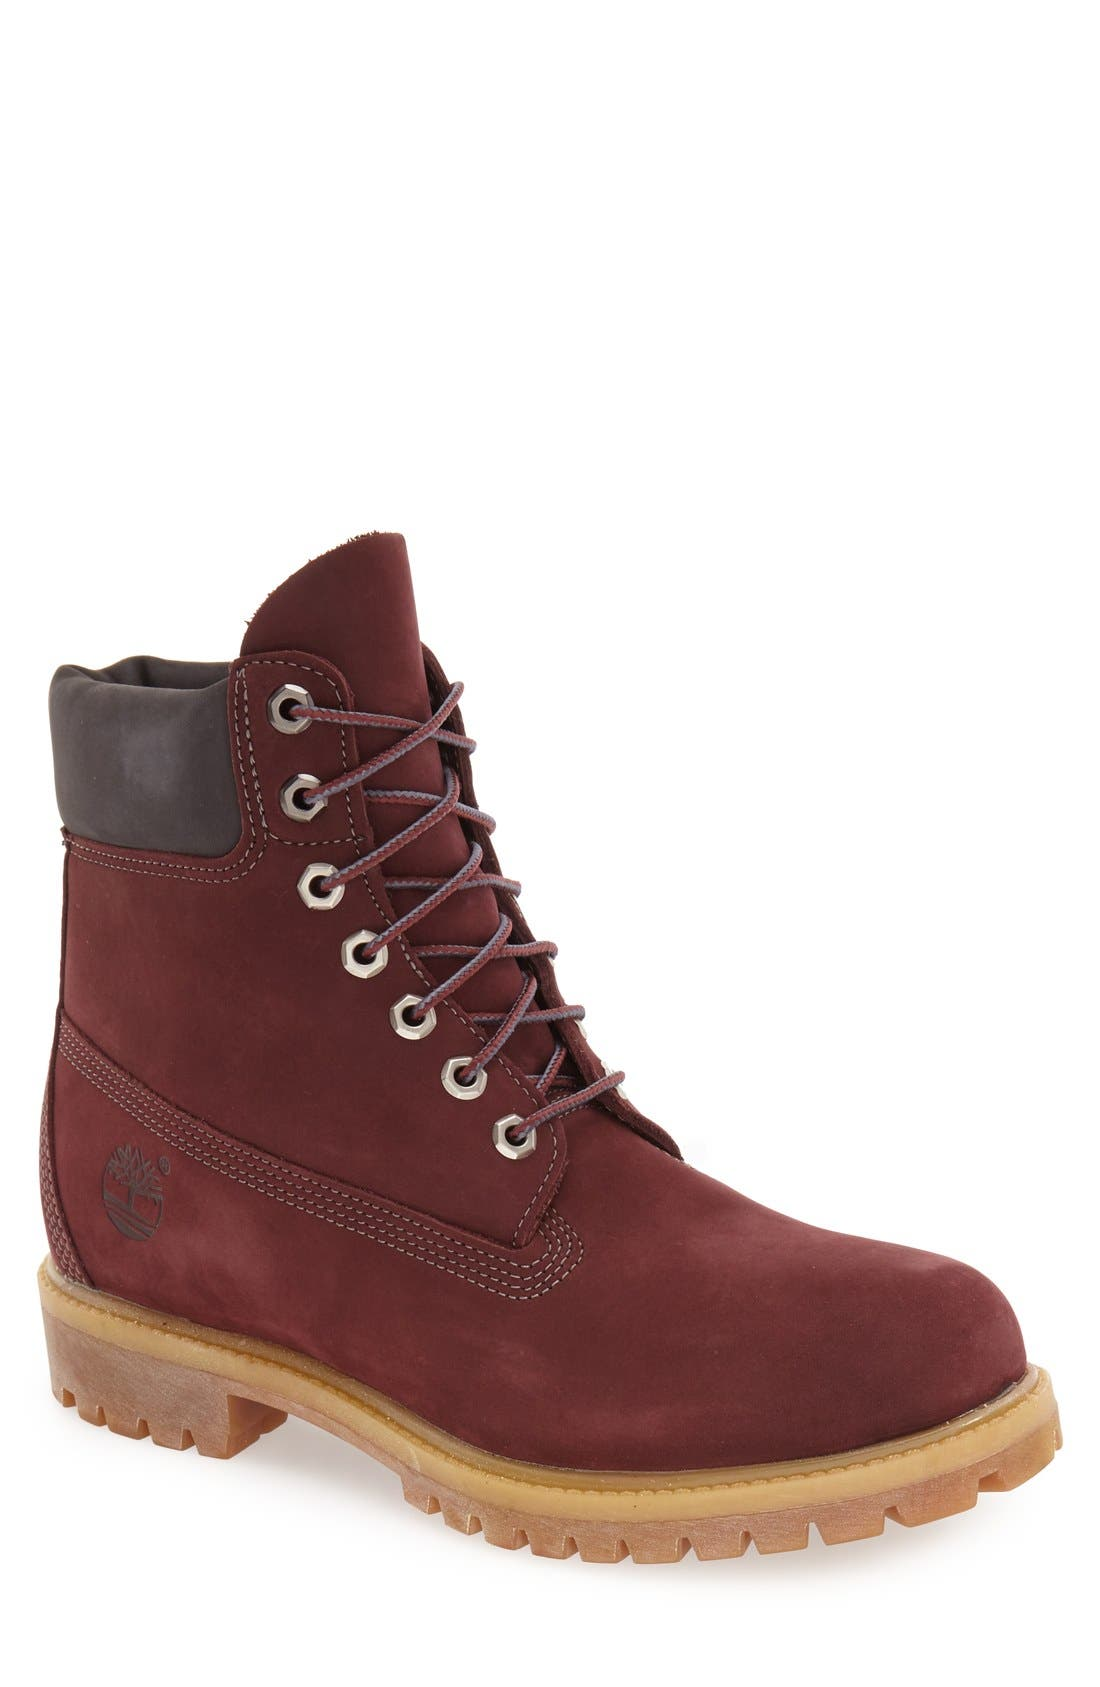 Alternate Image 1 Selected - Timberland 'Autumn Mashup' Waterproof Boot (Men)